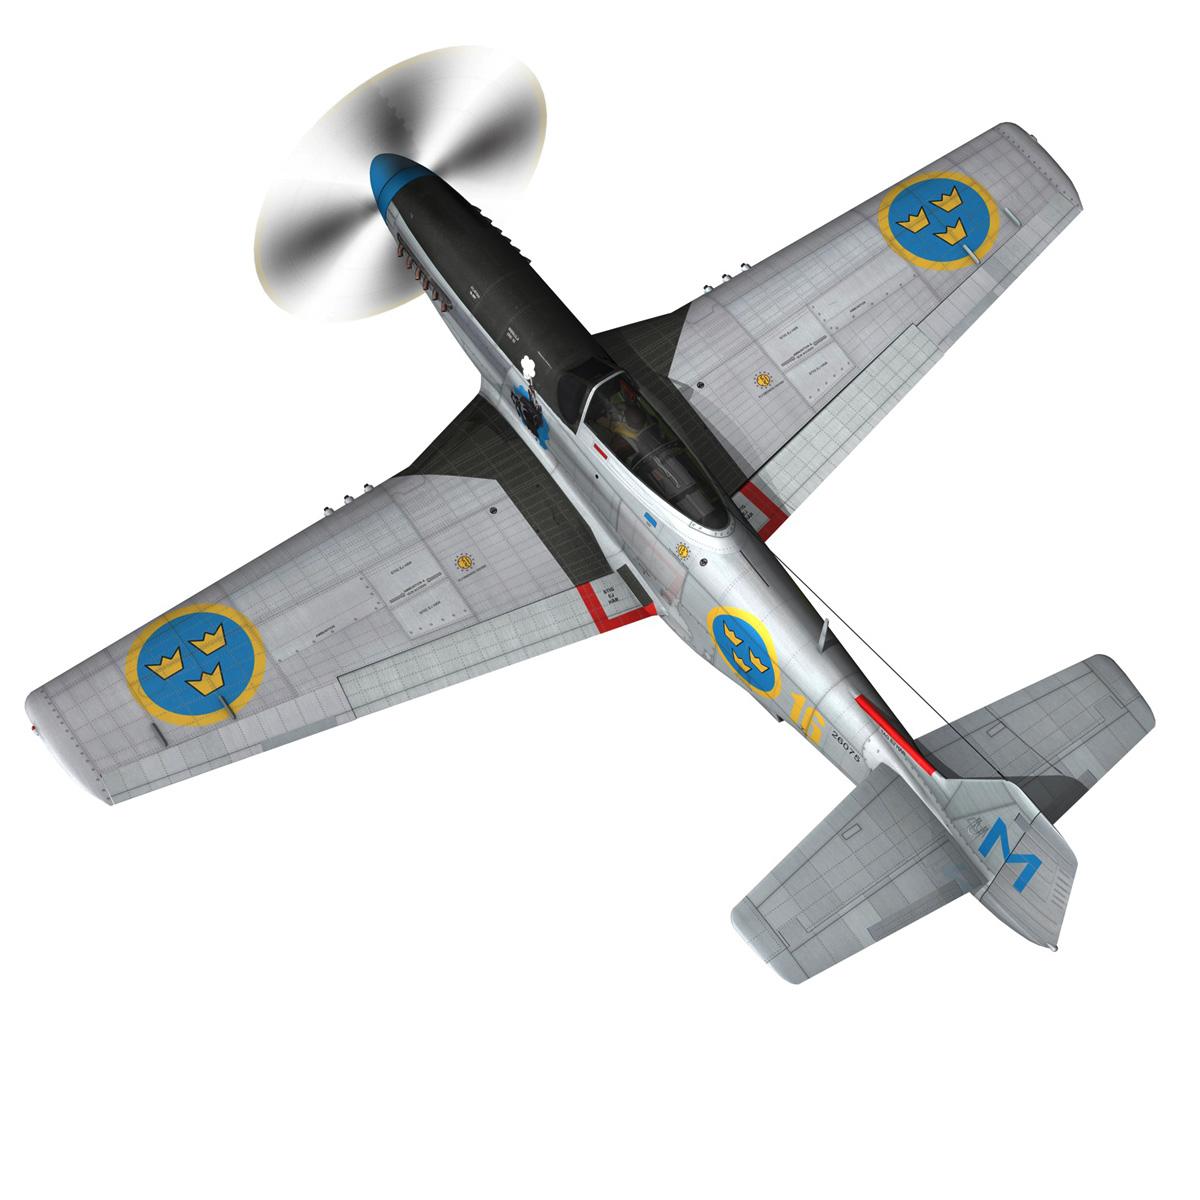 north american p-51d mustang – swedisch airforce 3d model fbx c4d lwo obj 268230